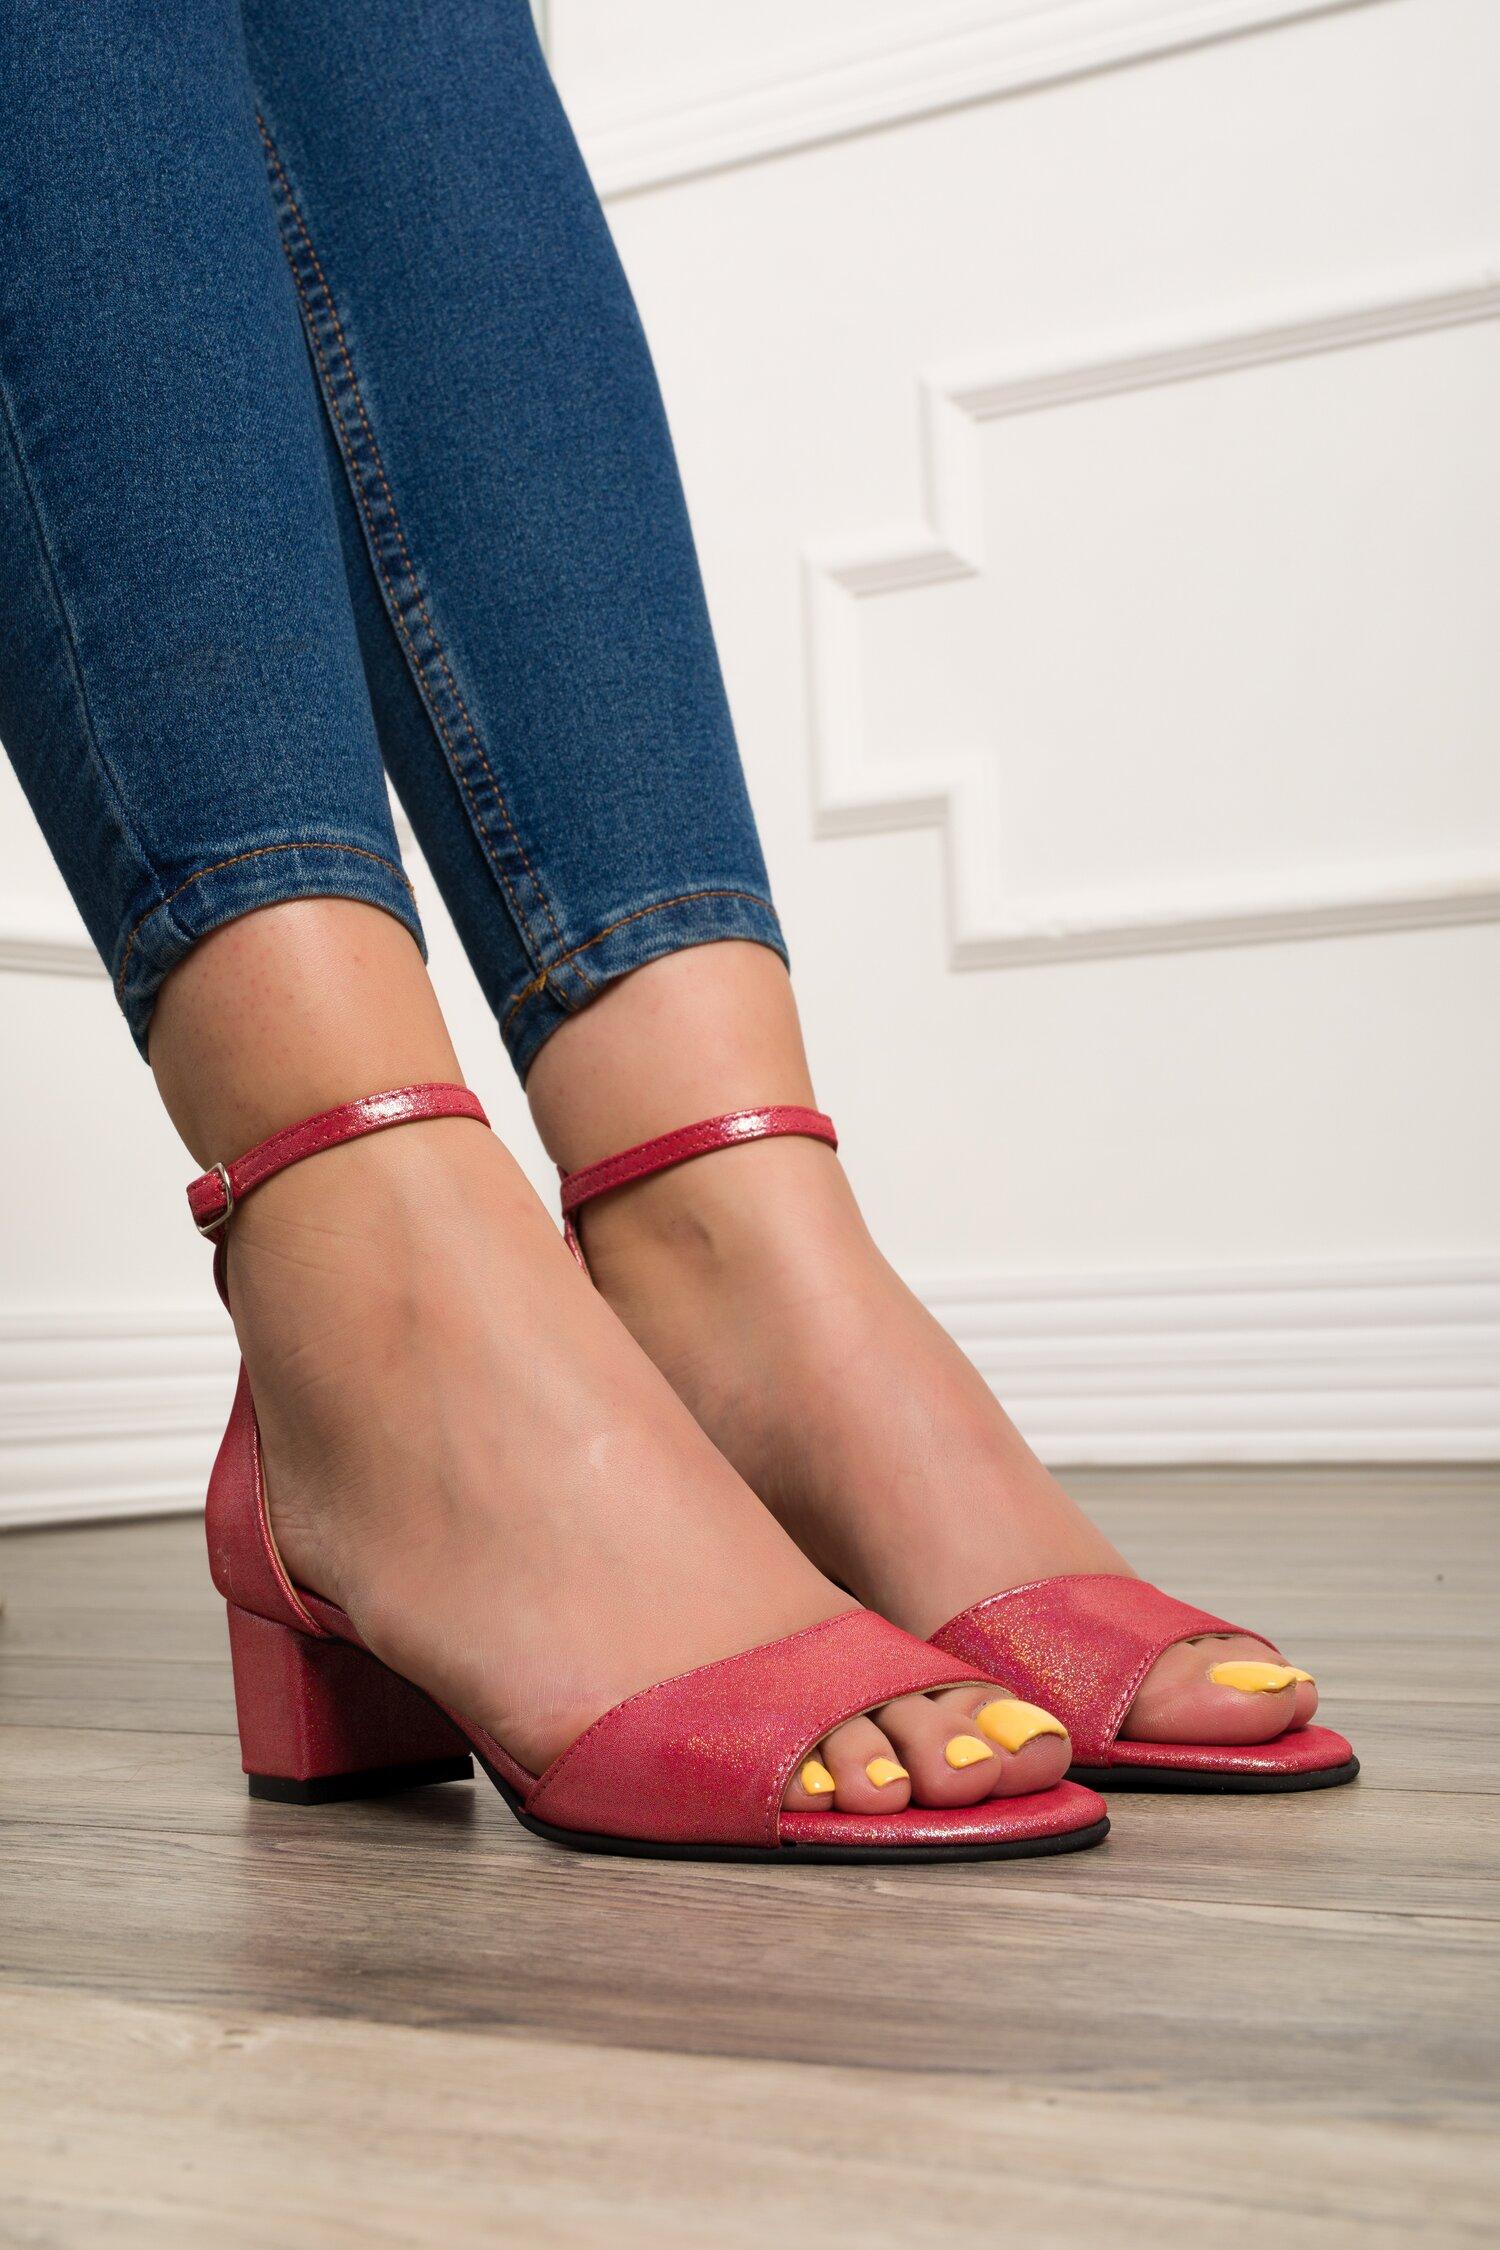 Sandale roz cu particule stralucitoare imagine